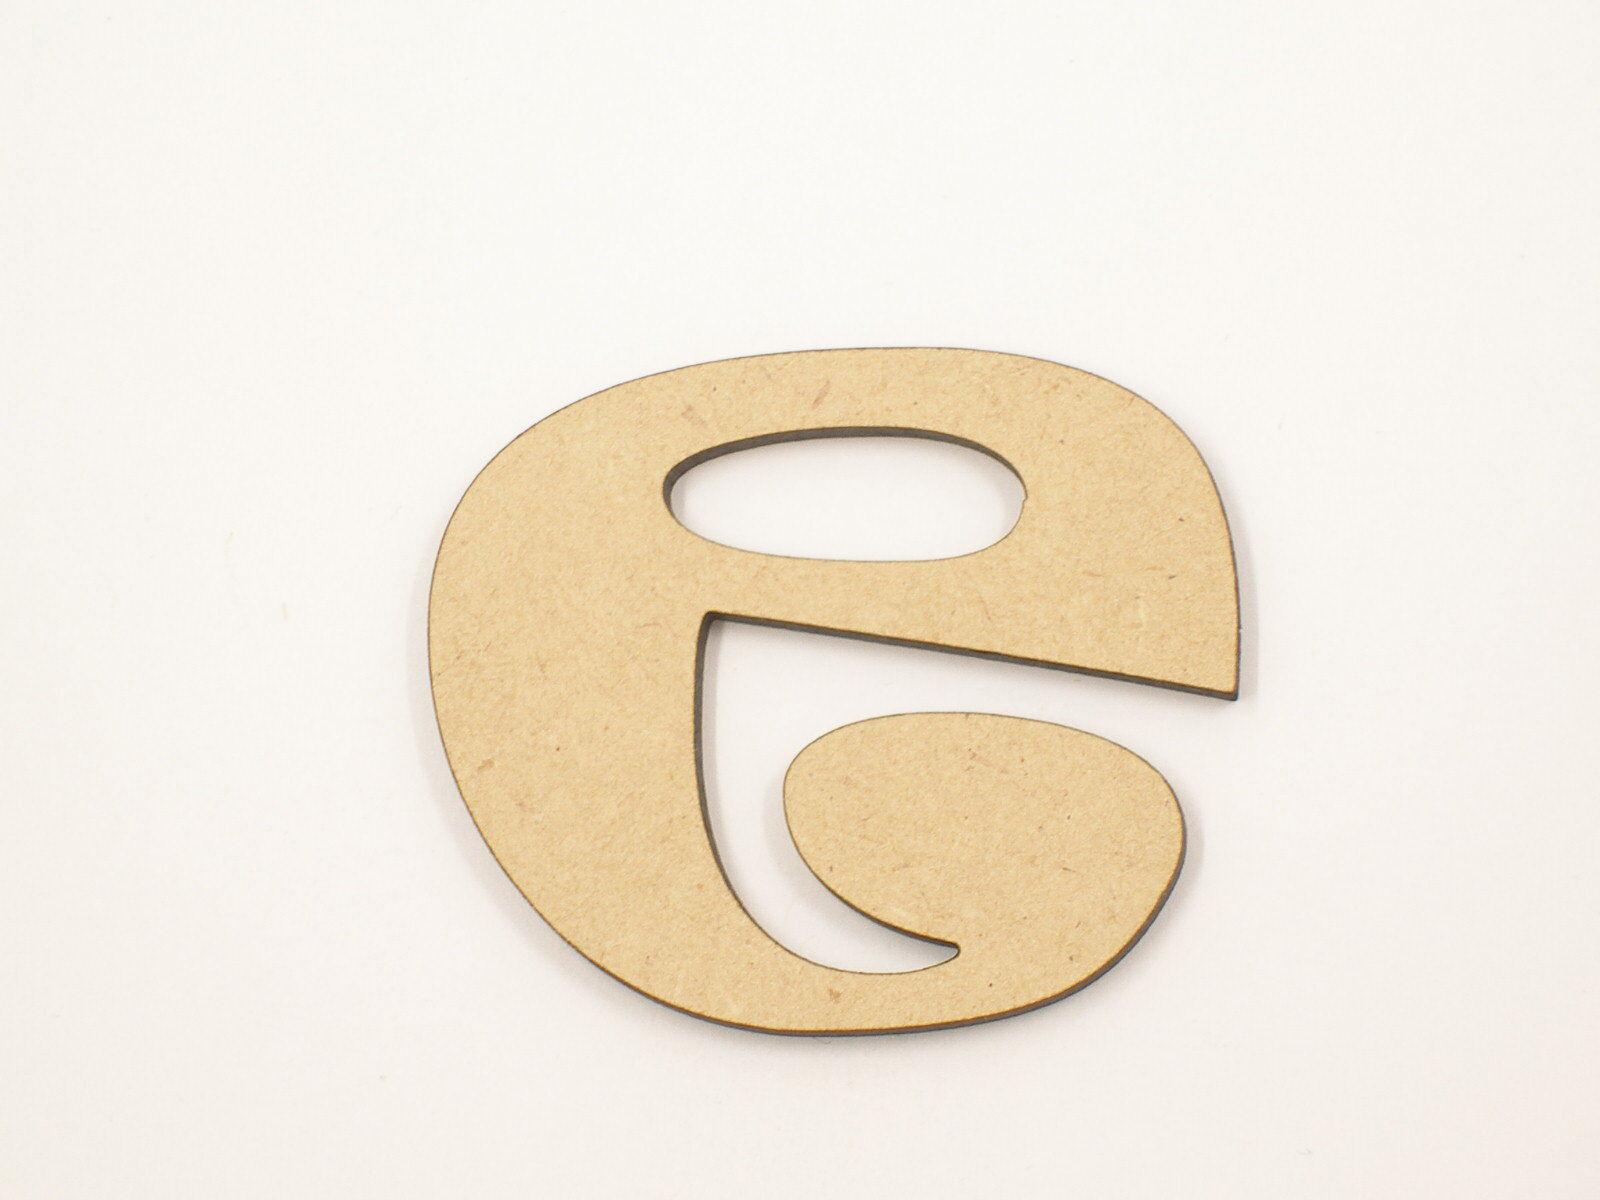 1.8mm x 20cm Large Wooden Letter Words Wood Letters Alphabet RAv Lowercase